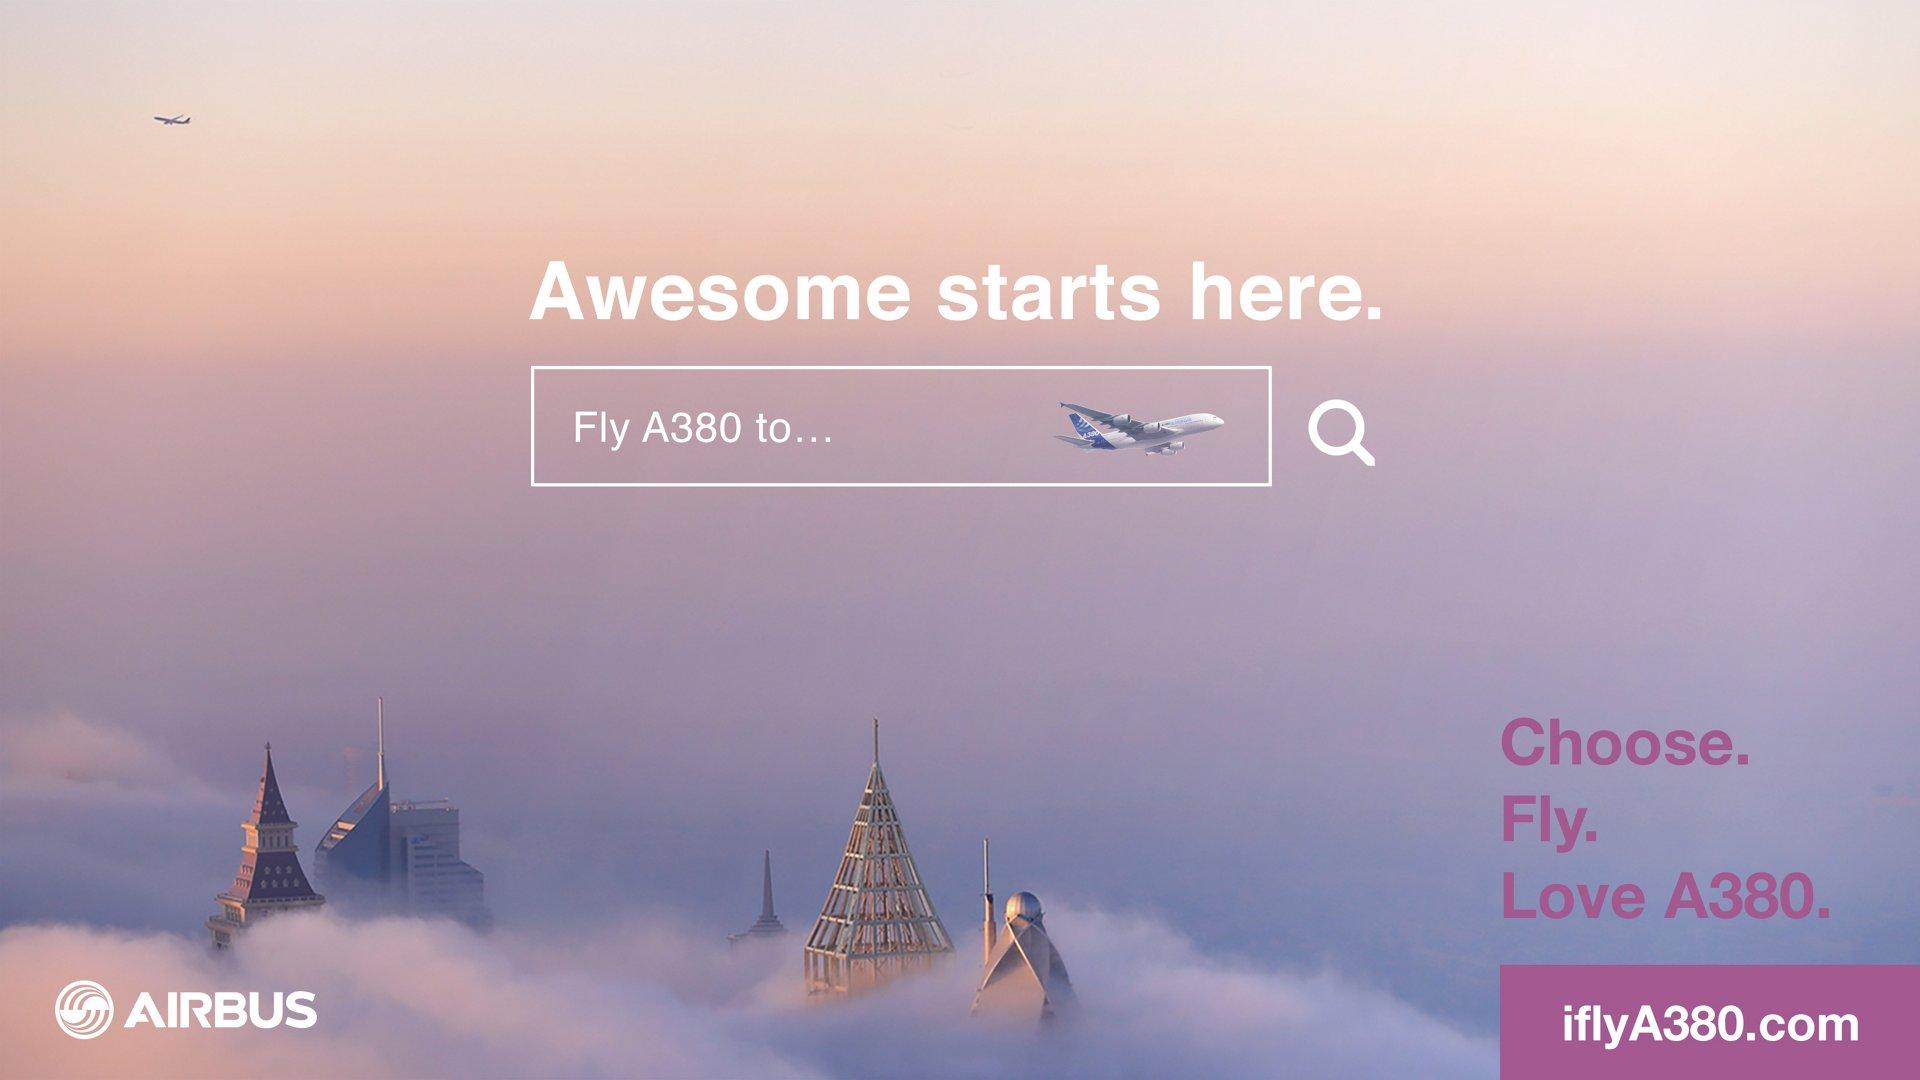 iflyA380.com